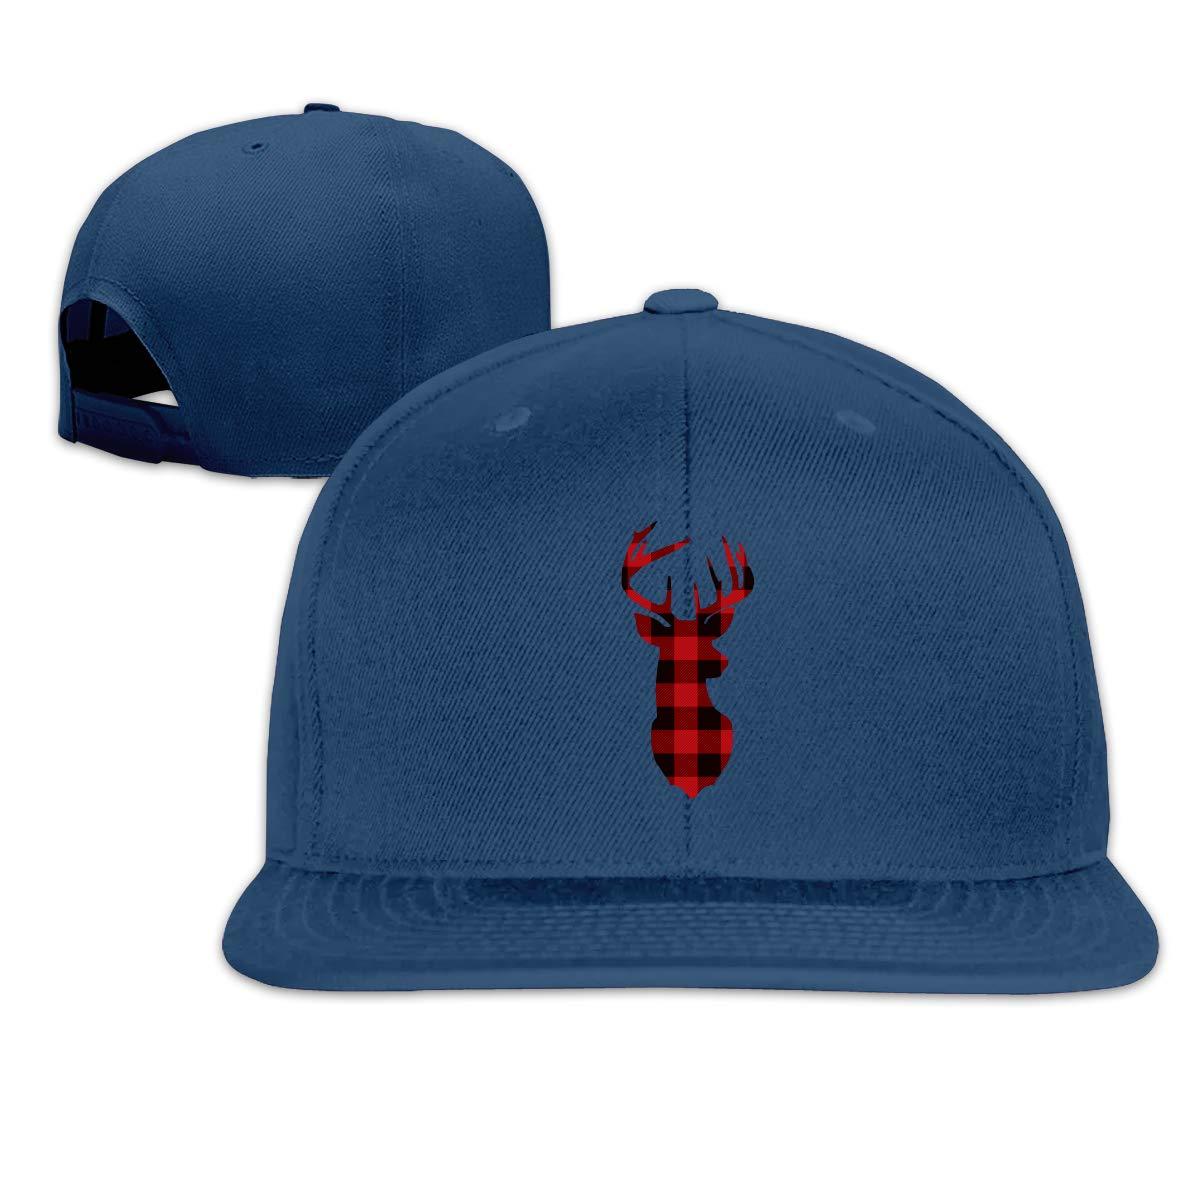 MOCSTONE Unisex Snapback Hat Buffalo Plaid Deer Adjustable Baseball Cap